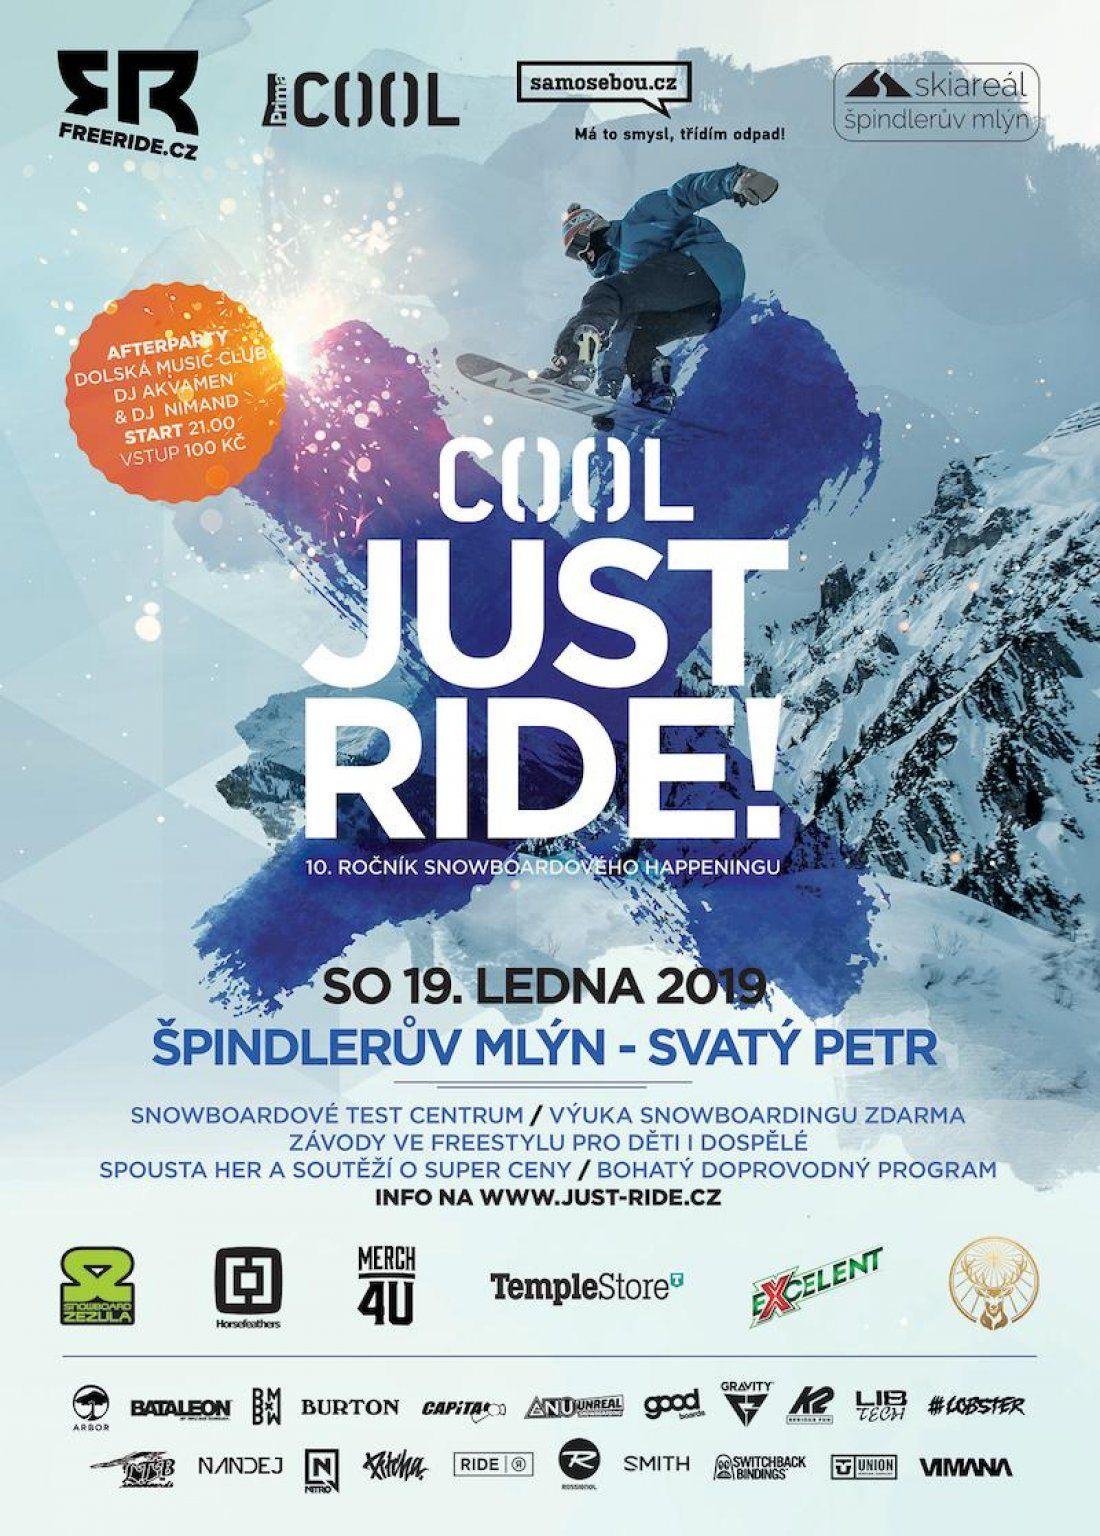 COOL Just Ride - pindlerv mln